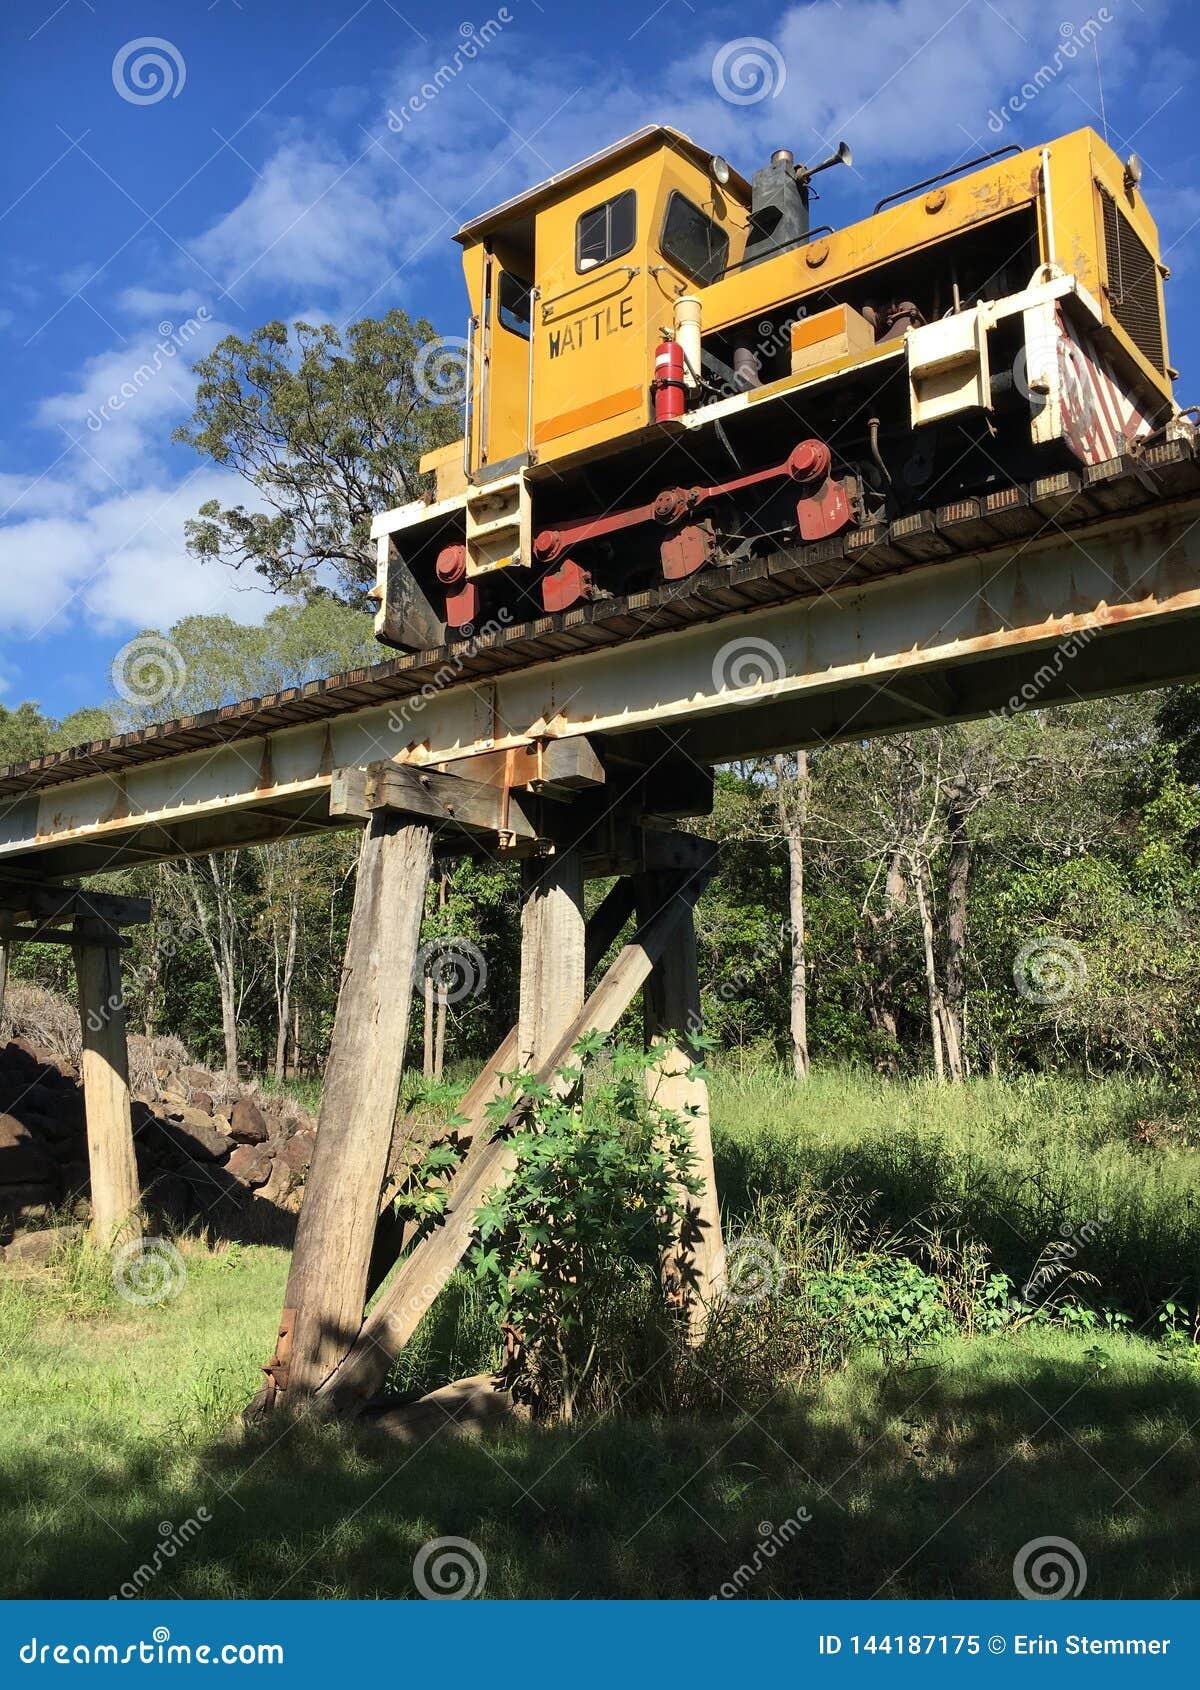 Cane Train Bundaburg Queensland